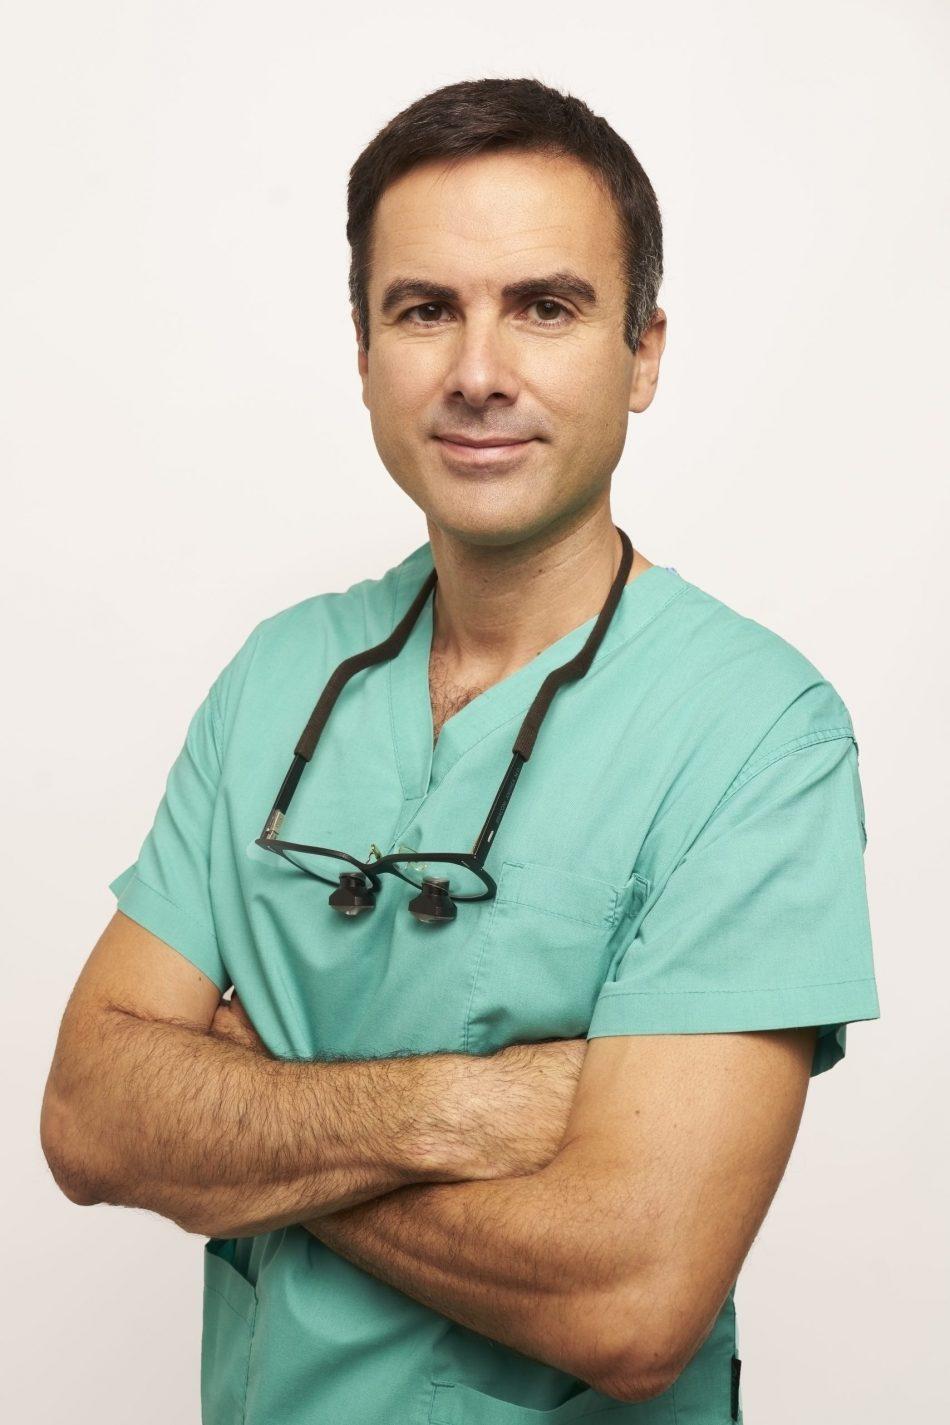 dott. ANDREA BRACONI